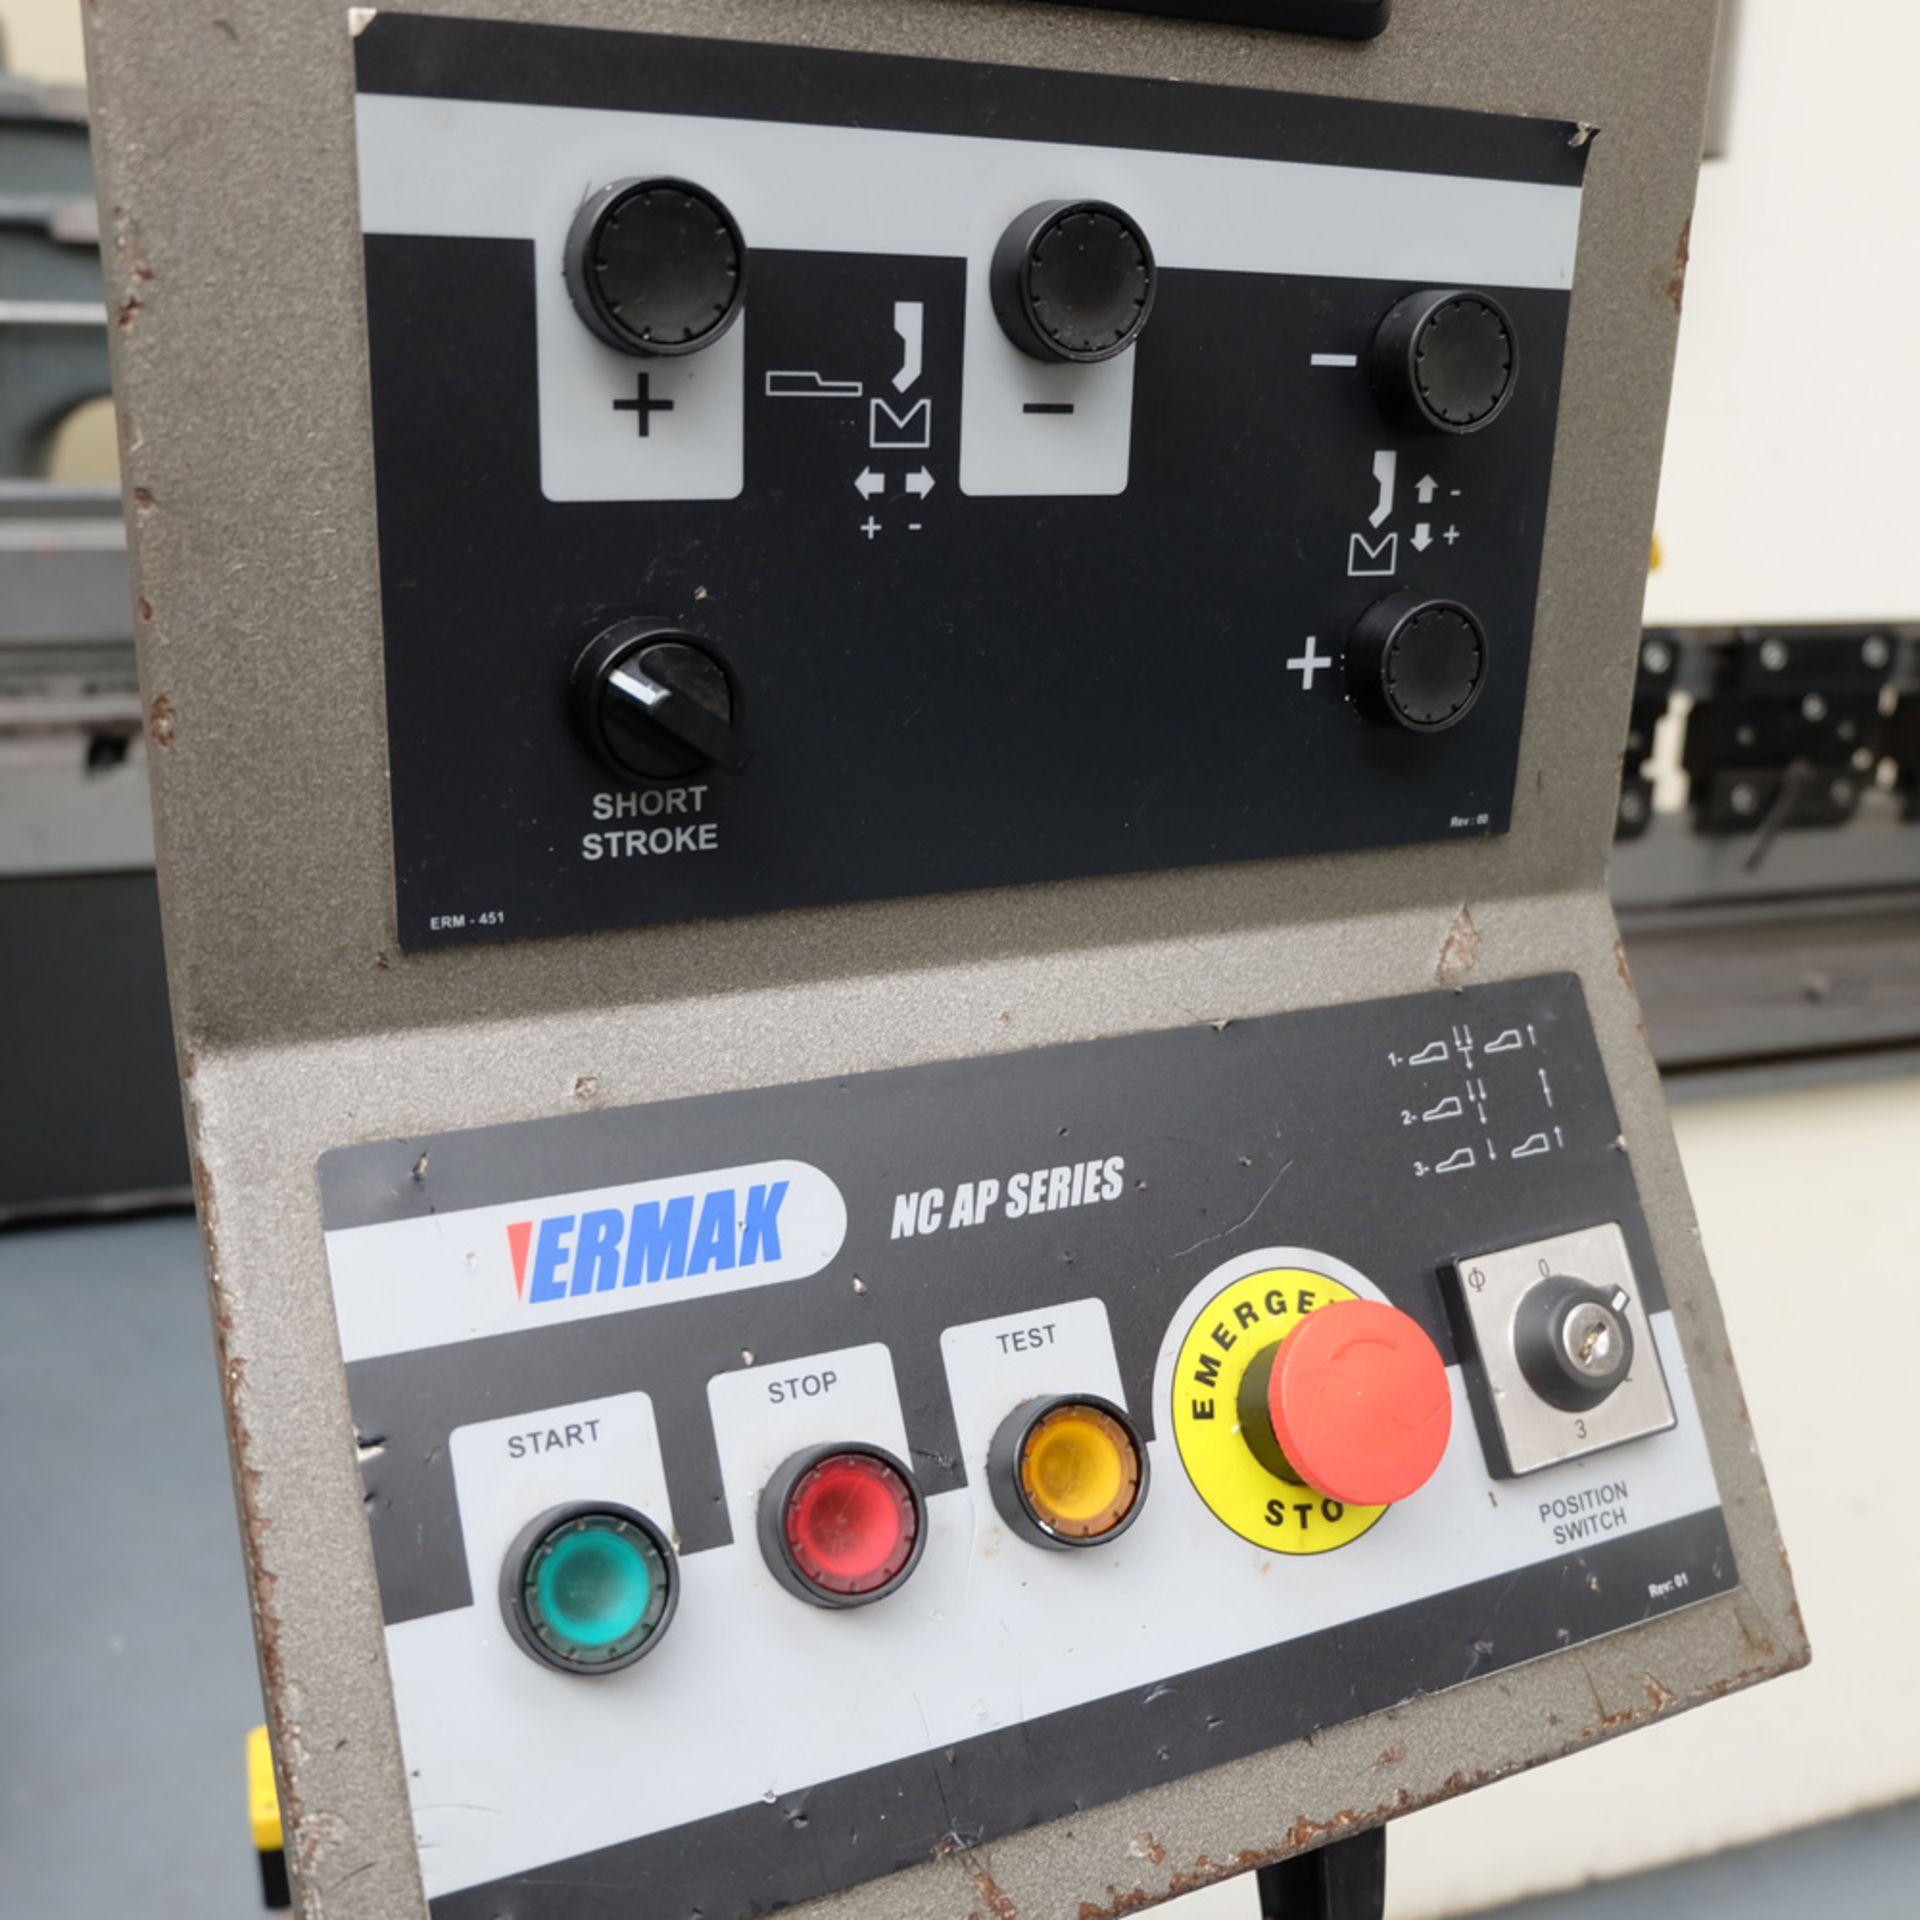 Ermak AP3120 Hydraulic Downstroke Press Brake. Capacity 3100mm x 6mm. Bending Force 120 Ton. - Image 4 of 14